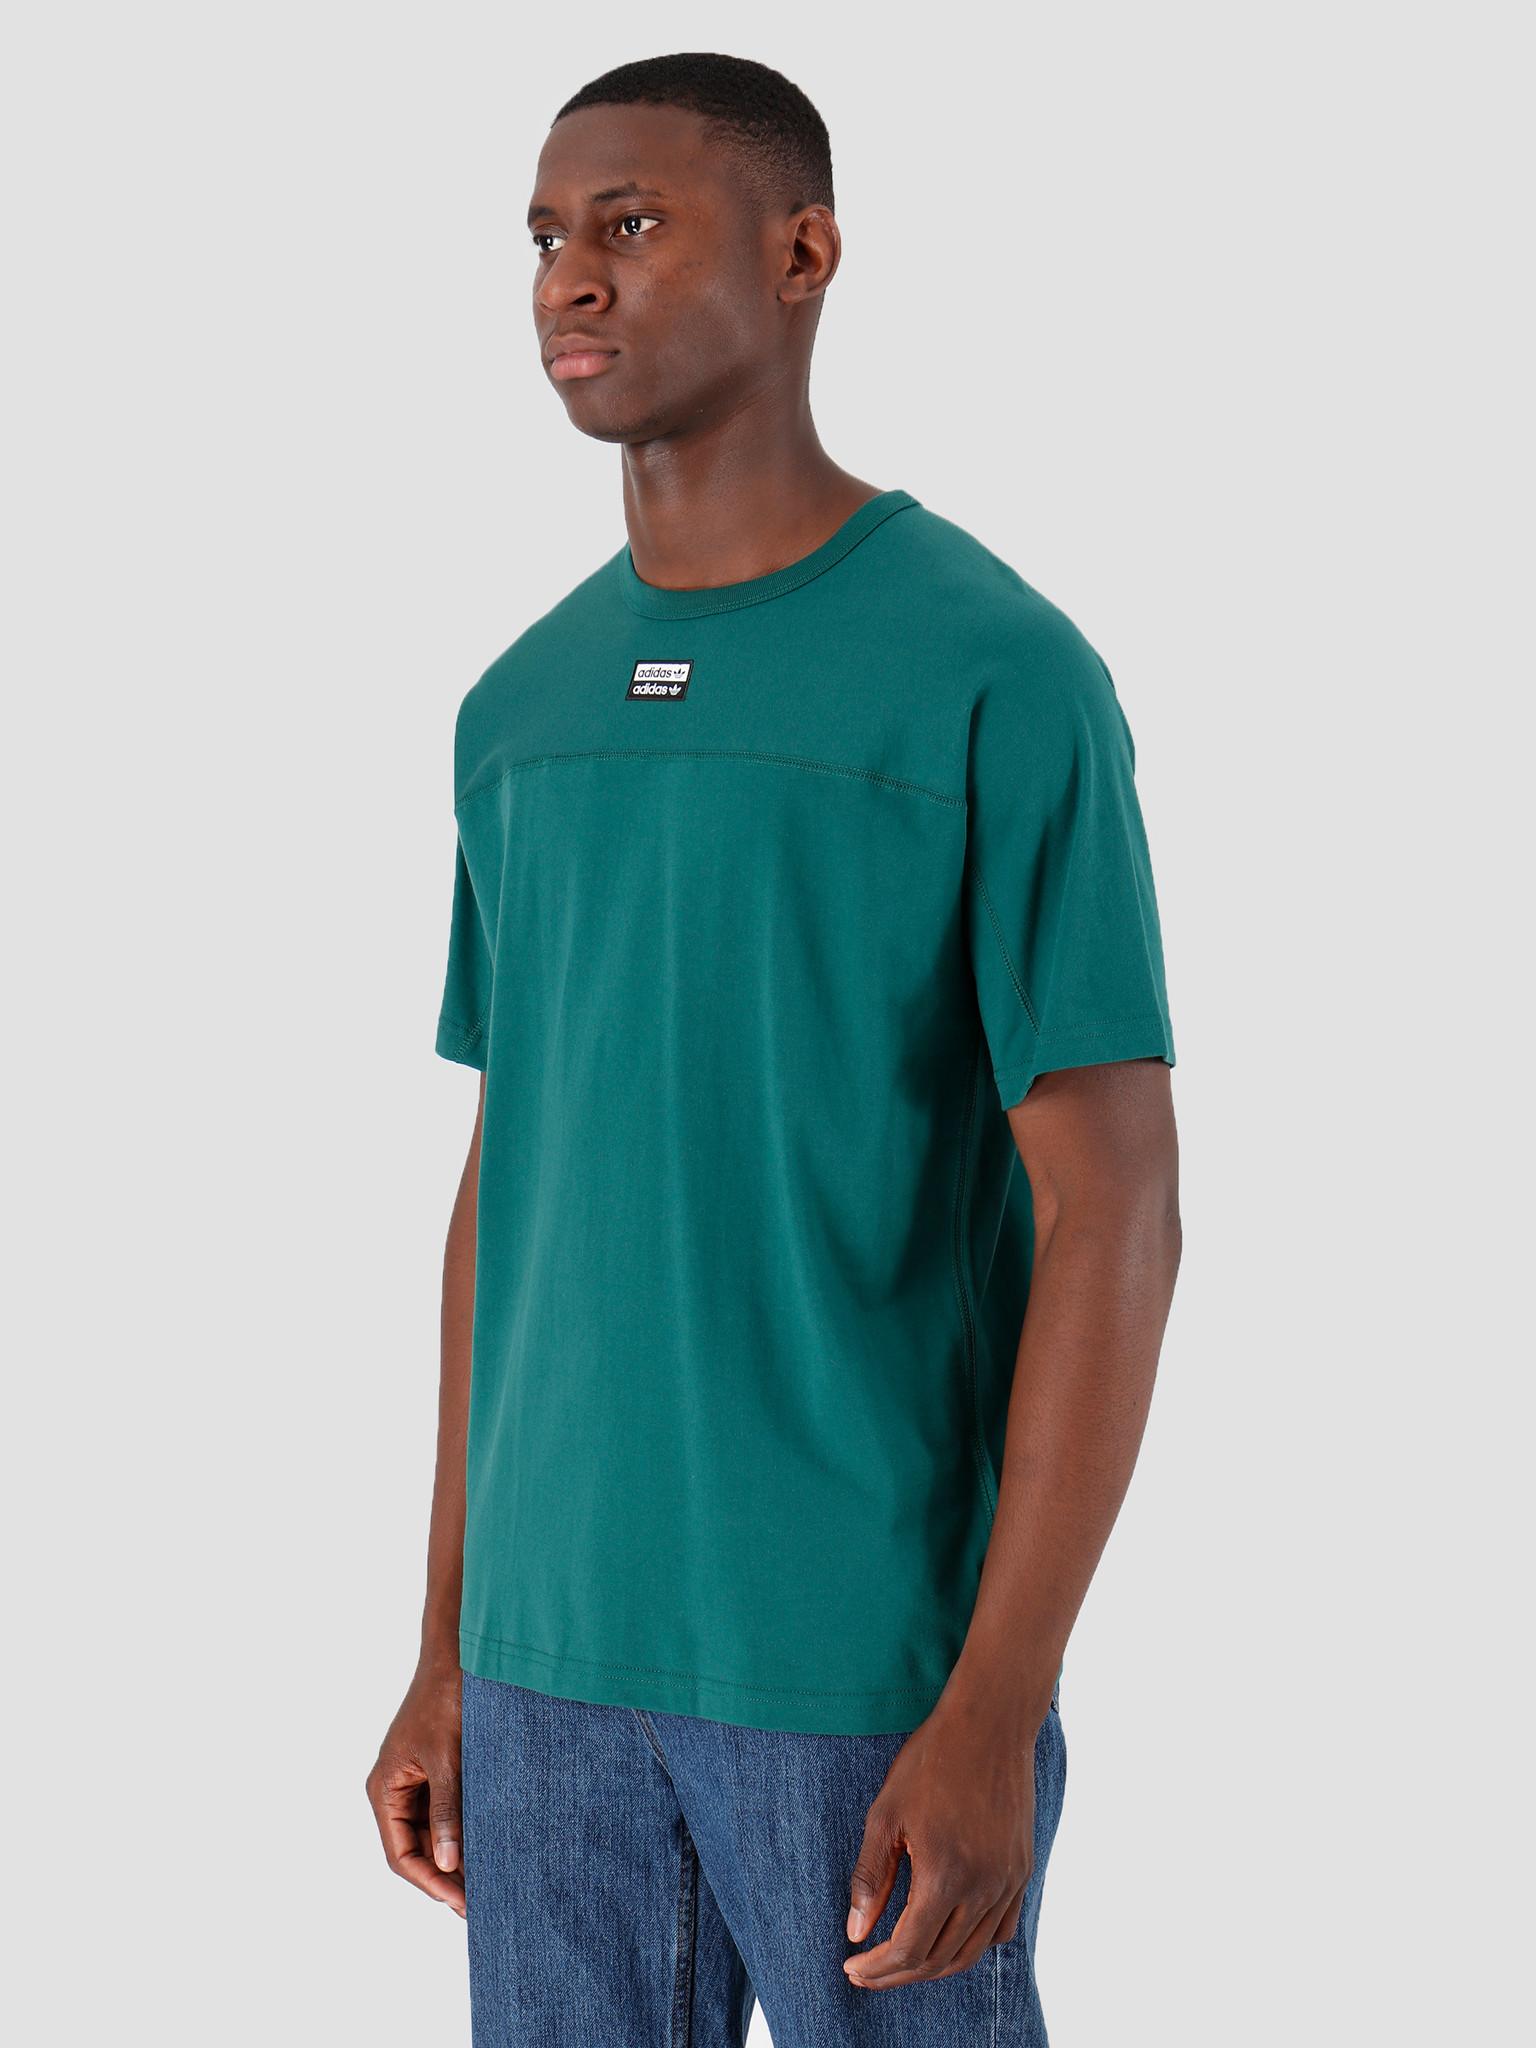 adidas adidas R.Y.V Blkd T-Shirt Cgreen ED7147